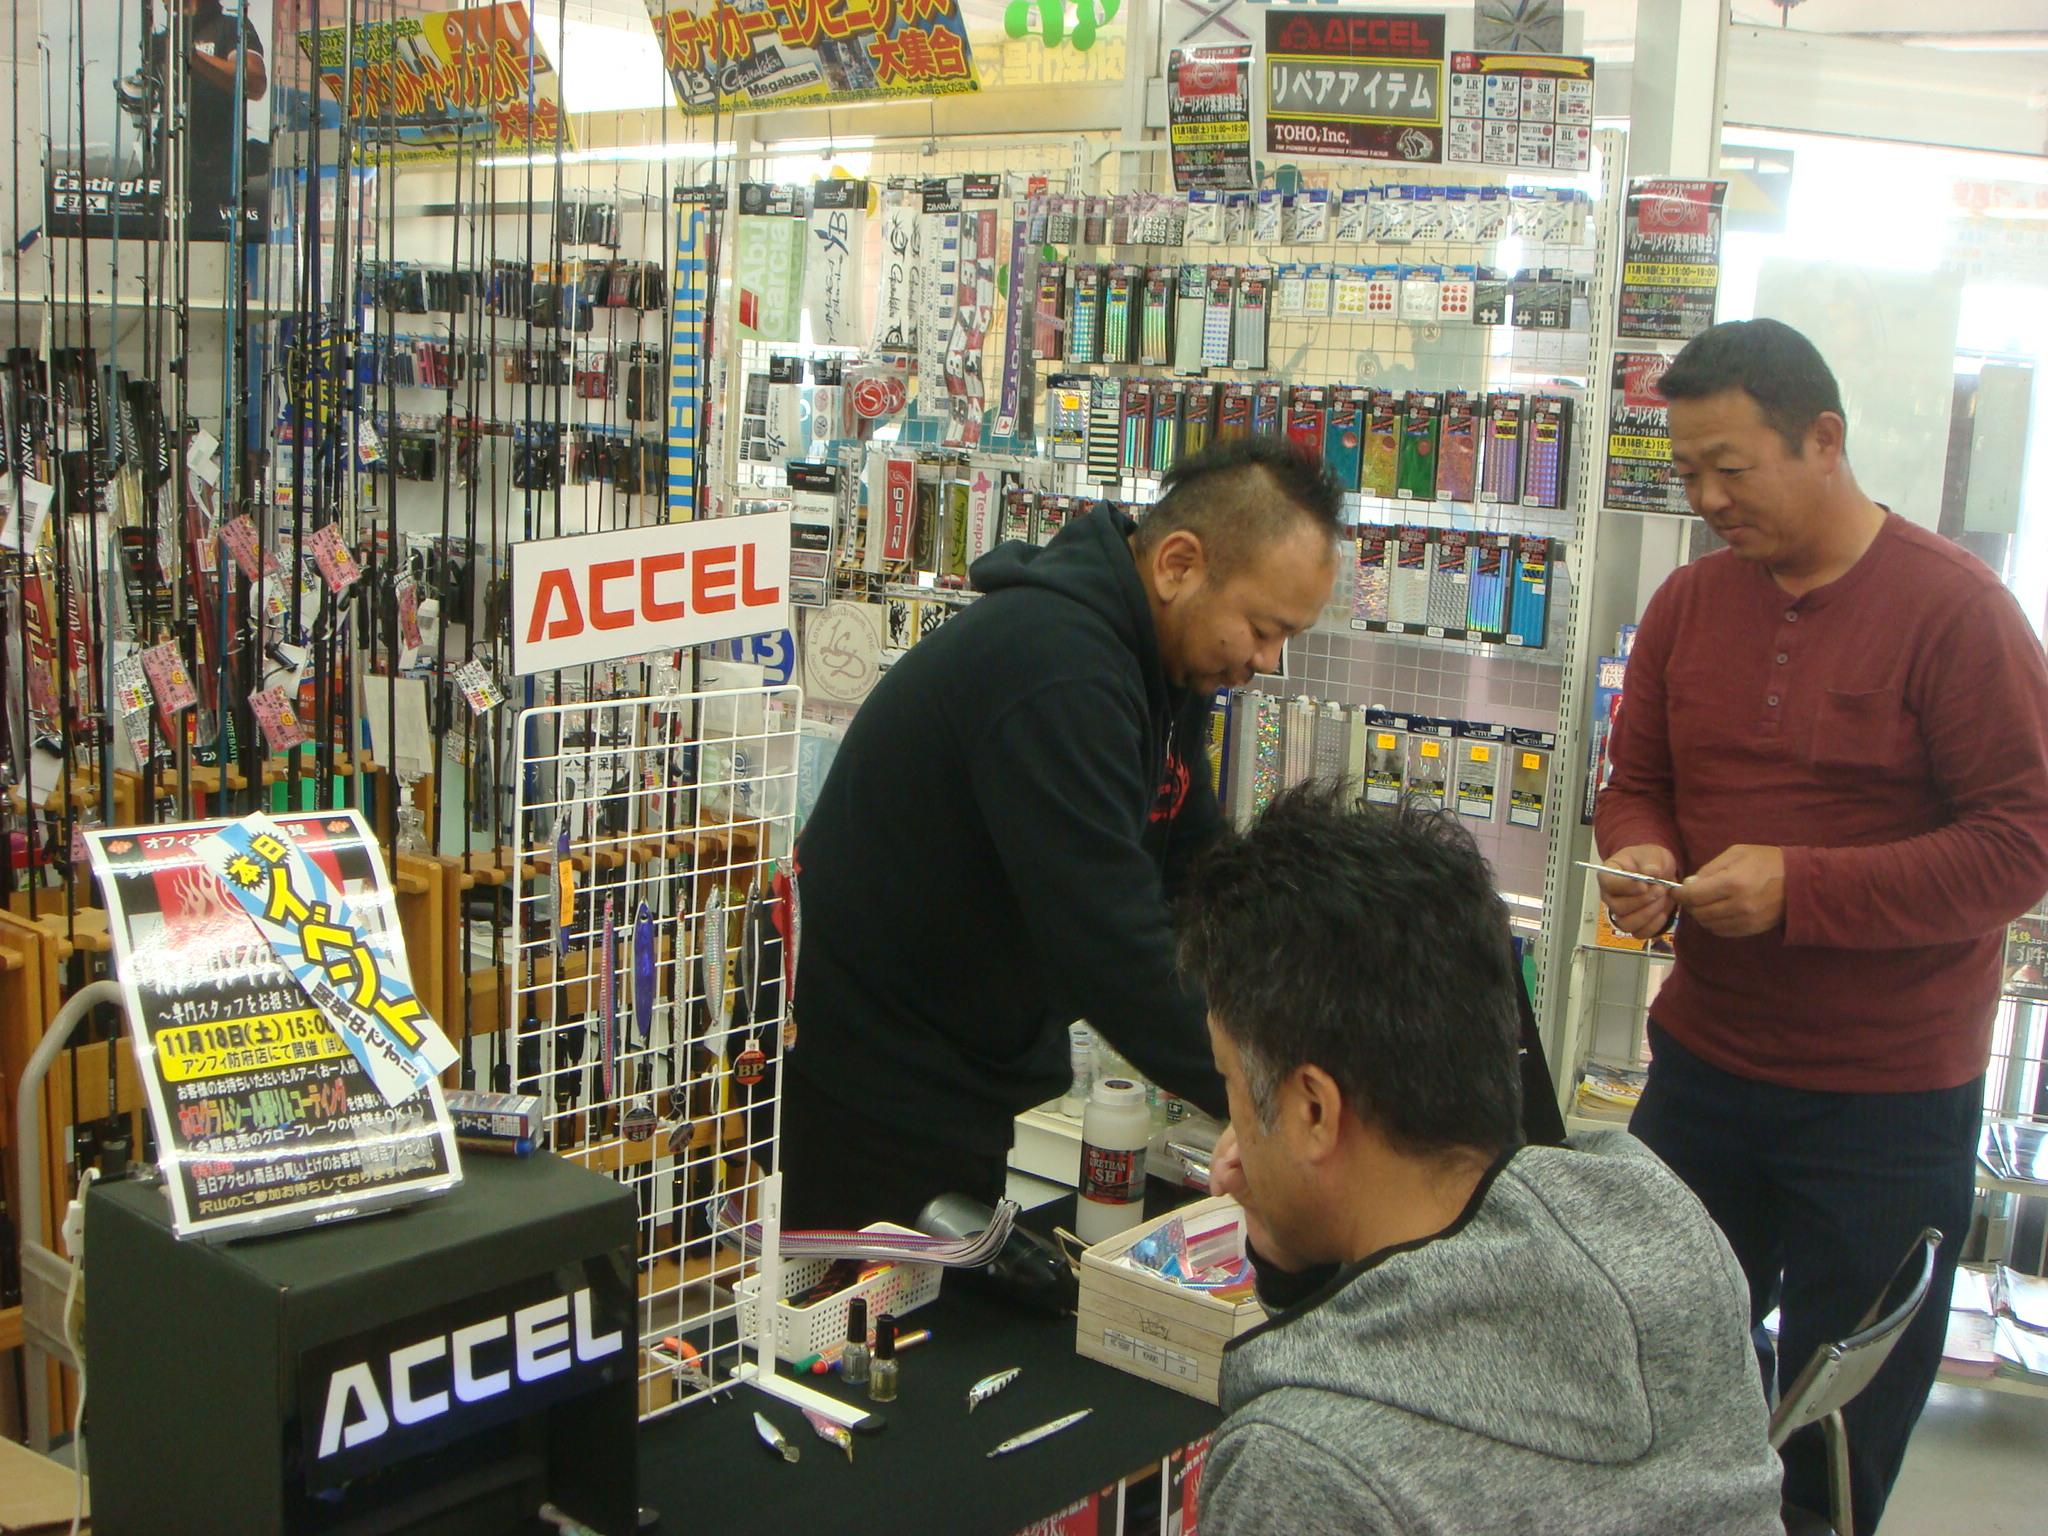 http://www.e-angle.co.jp/shop/news/DSC02449.JPG